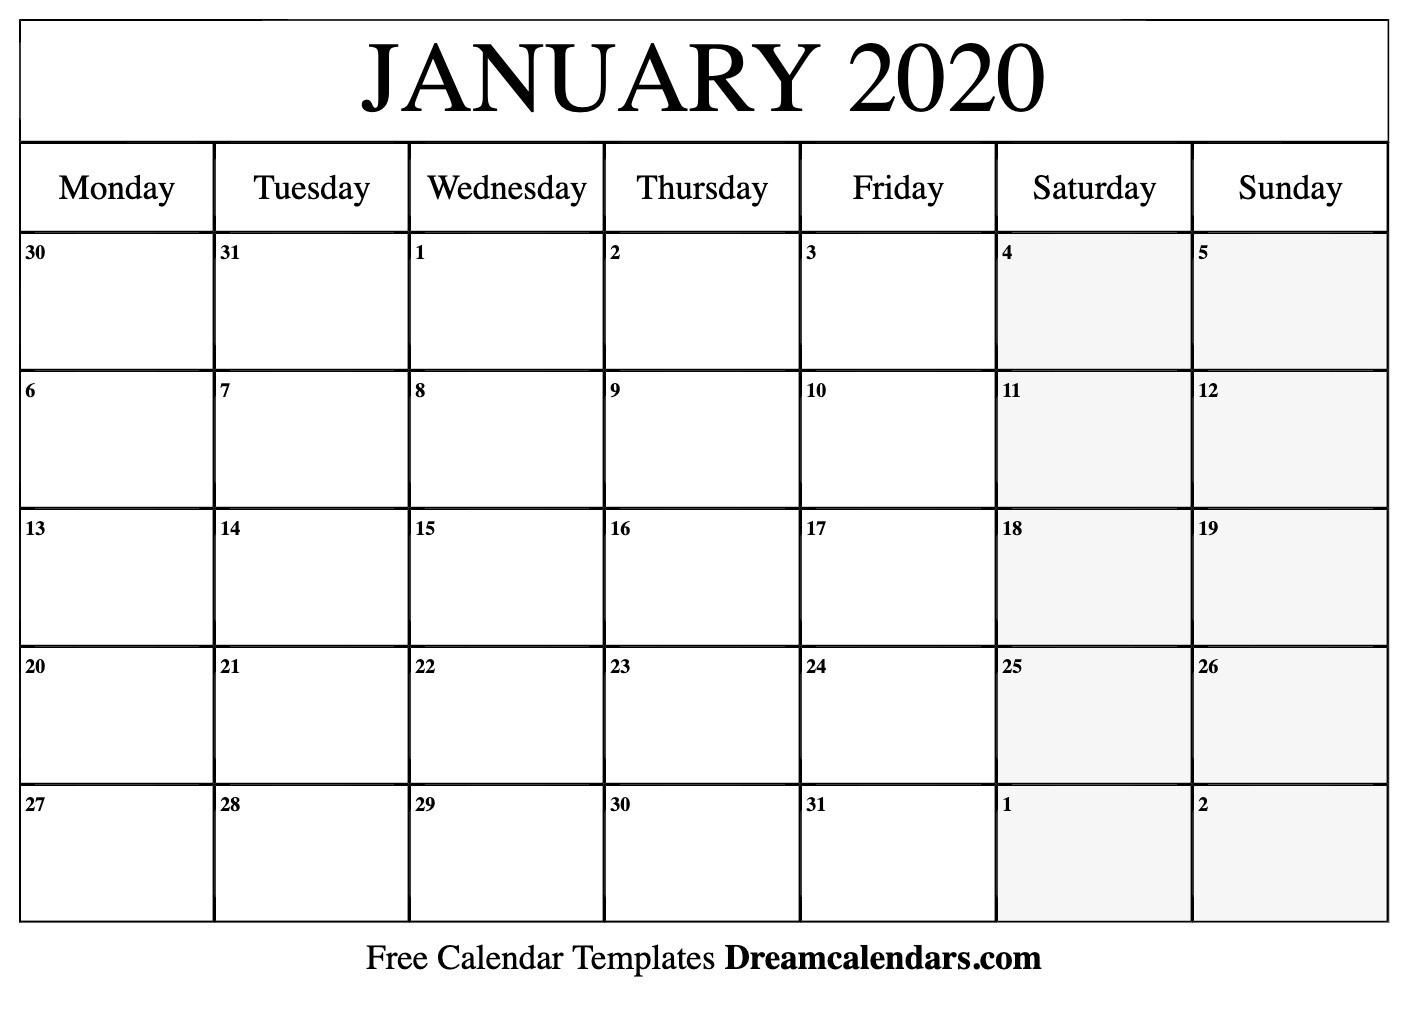 Printable January 2020 Calendar-January 2020 Calendar Page